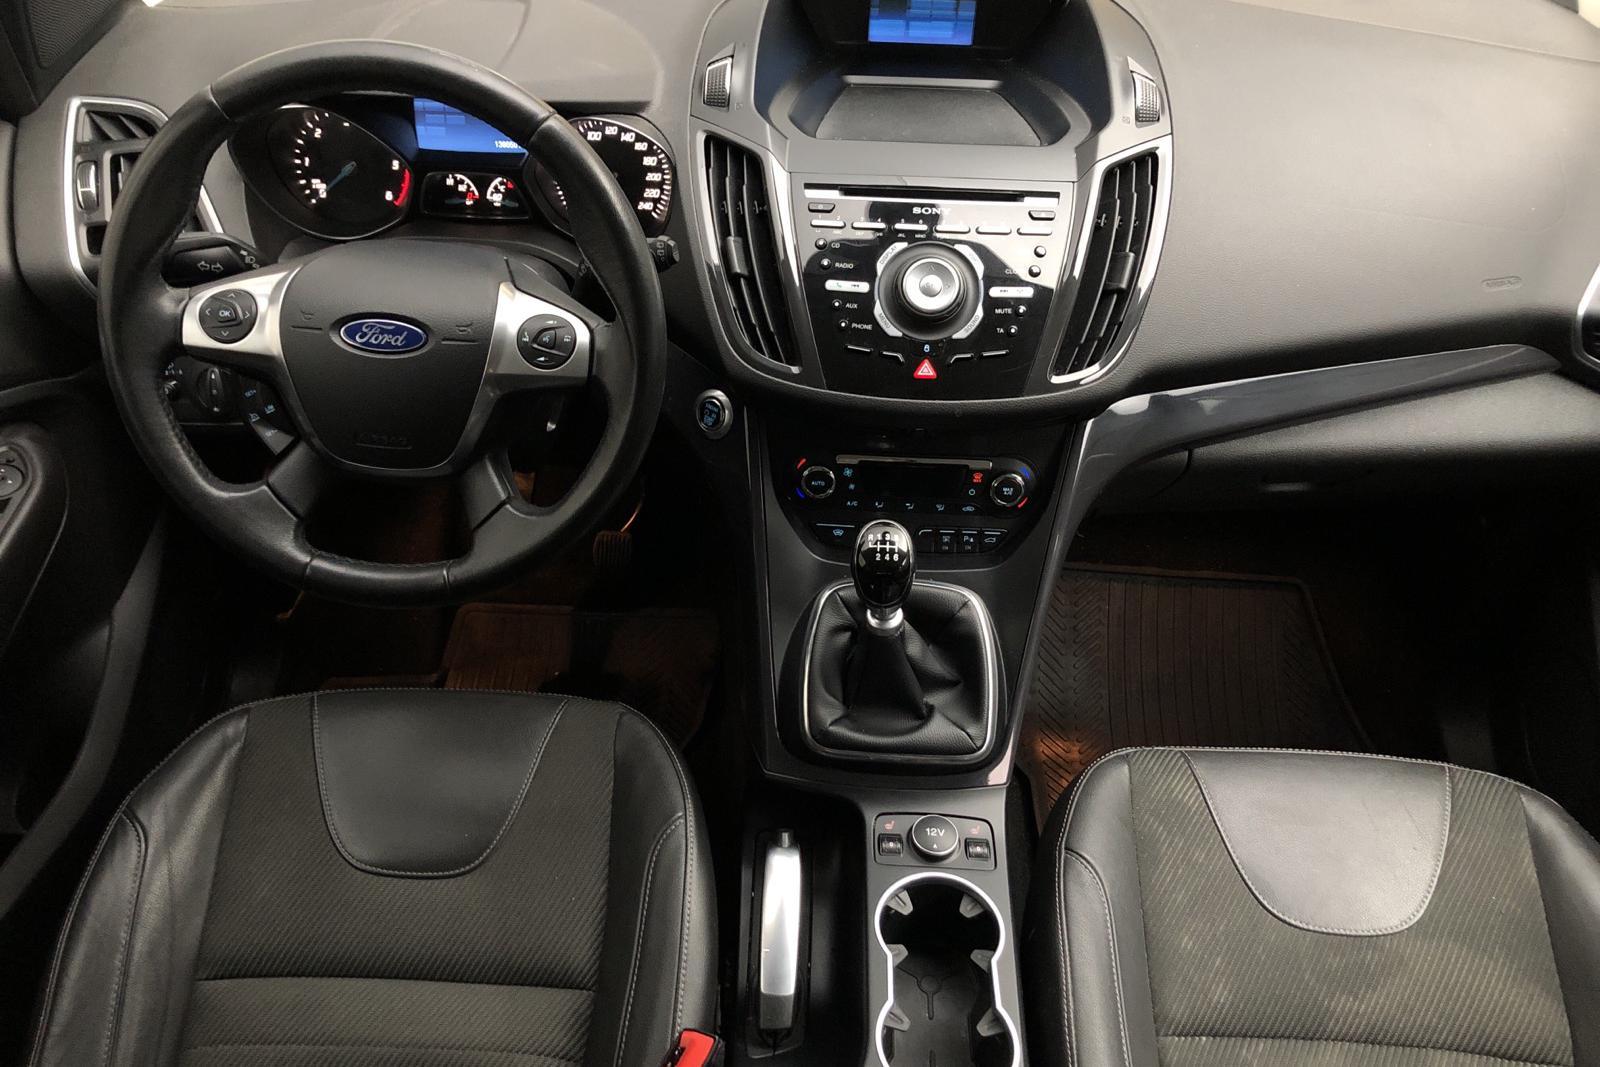 Ford Kuga 2.0 TDCi 4WD (140hk) - 136 050 km - Manual - gray - 2014